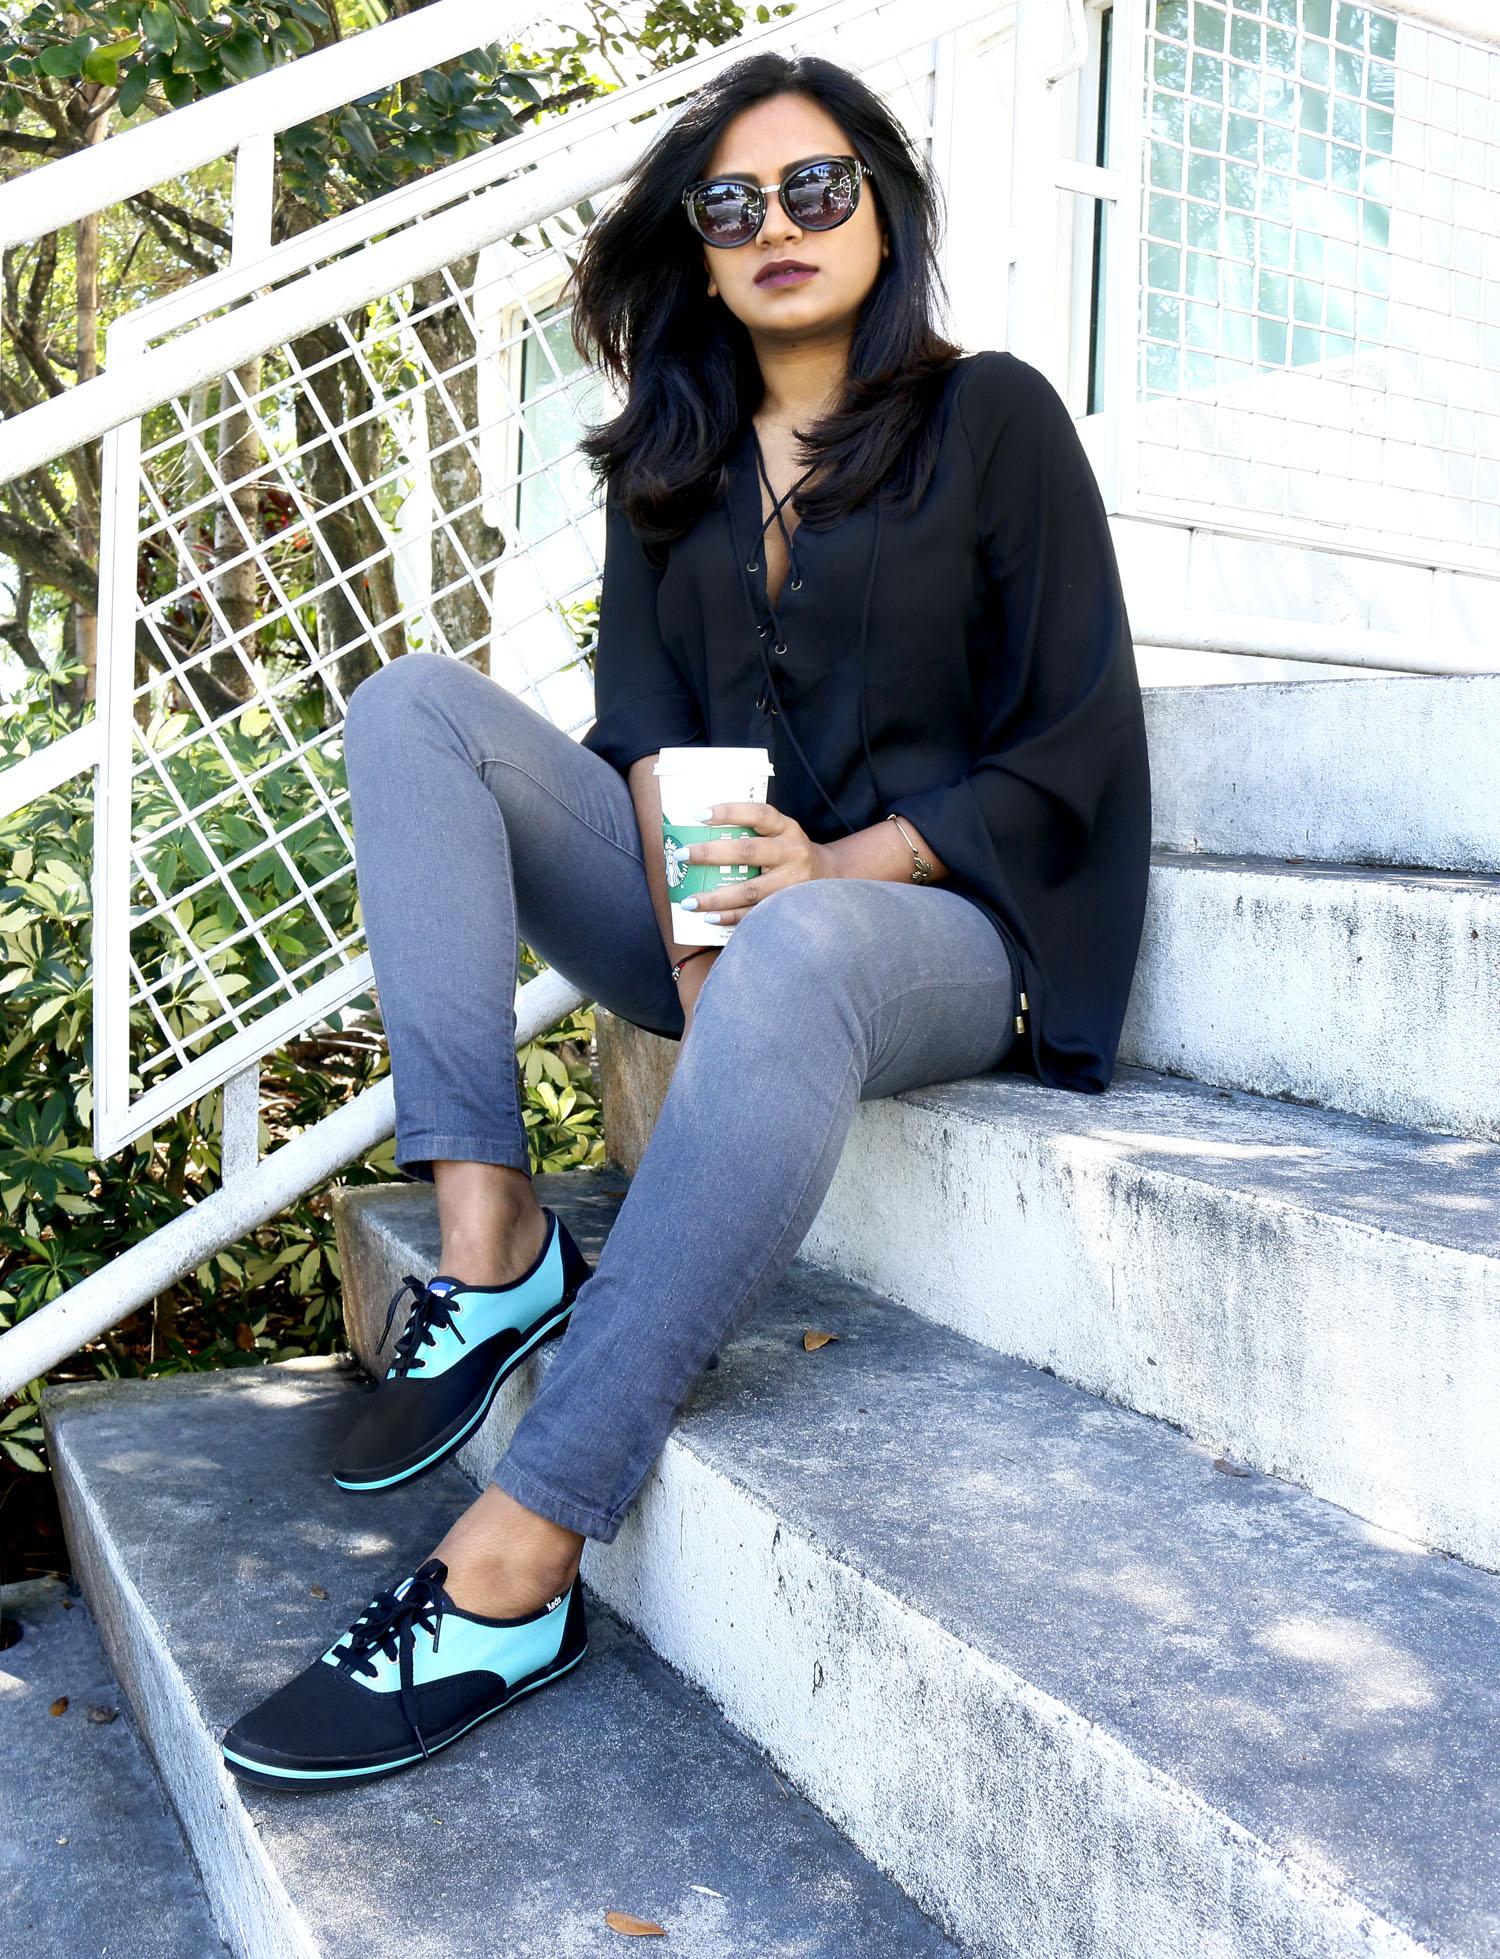 Digital-Influencer-Afroza-Khan-Custom-Keds (1)